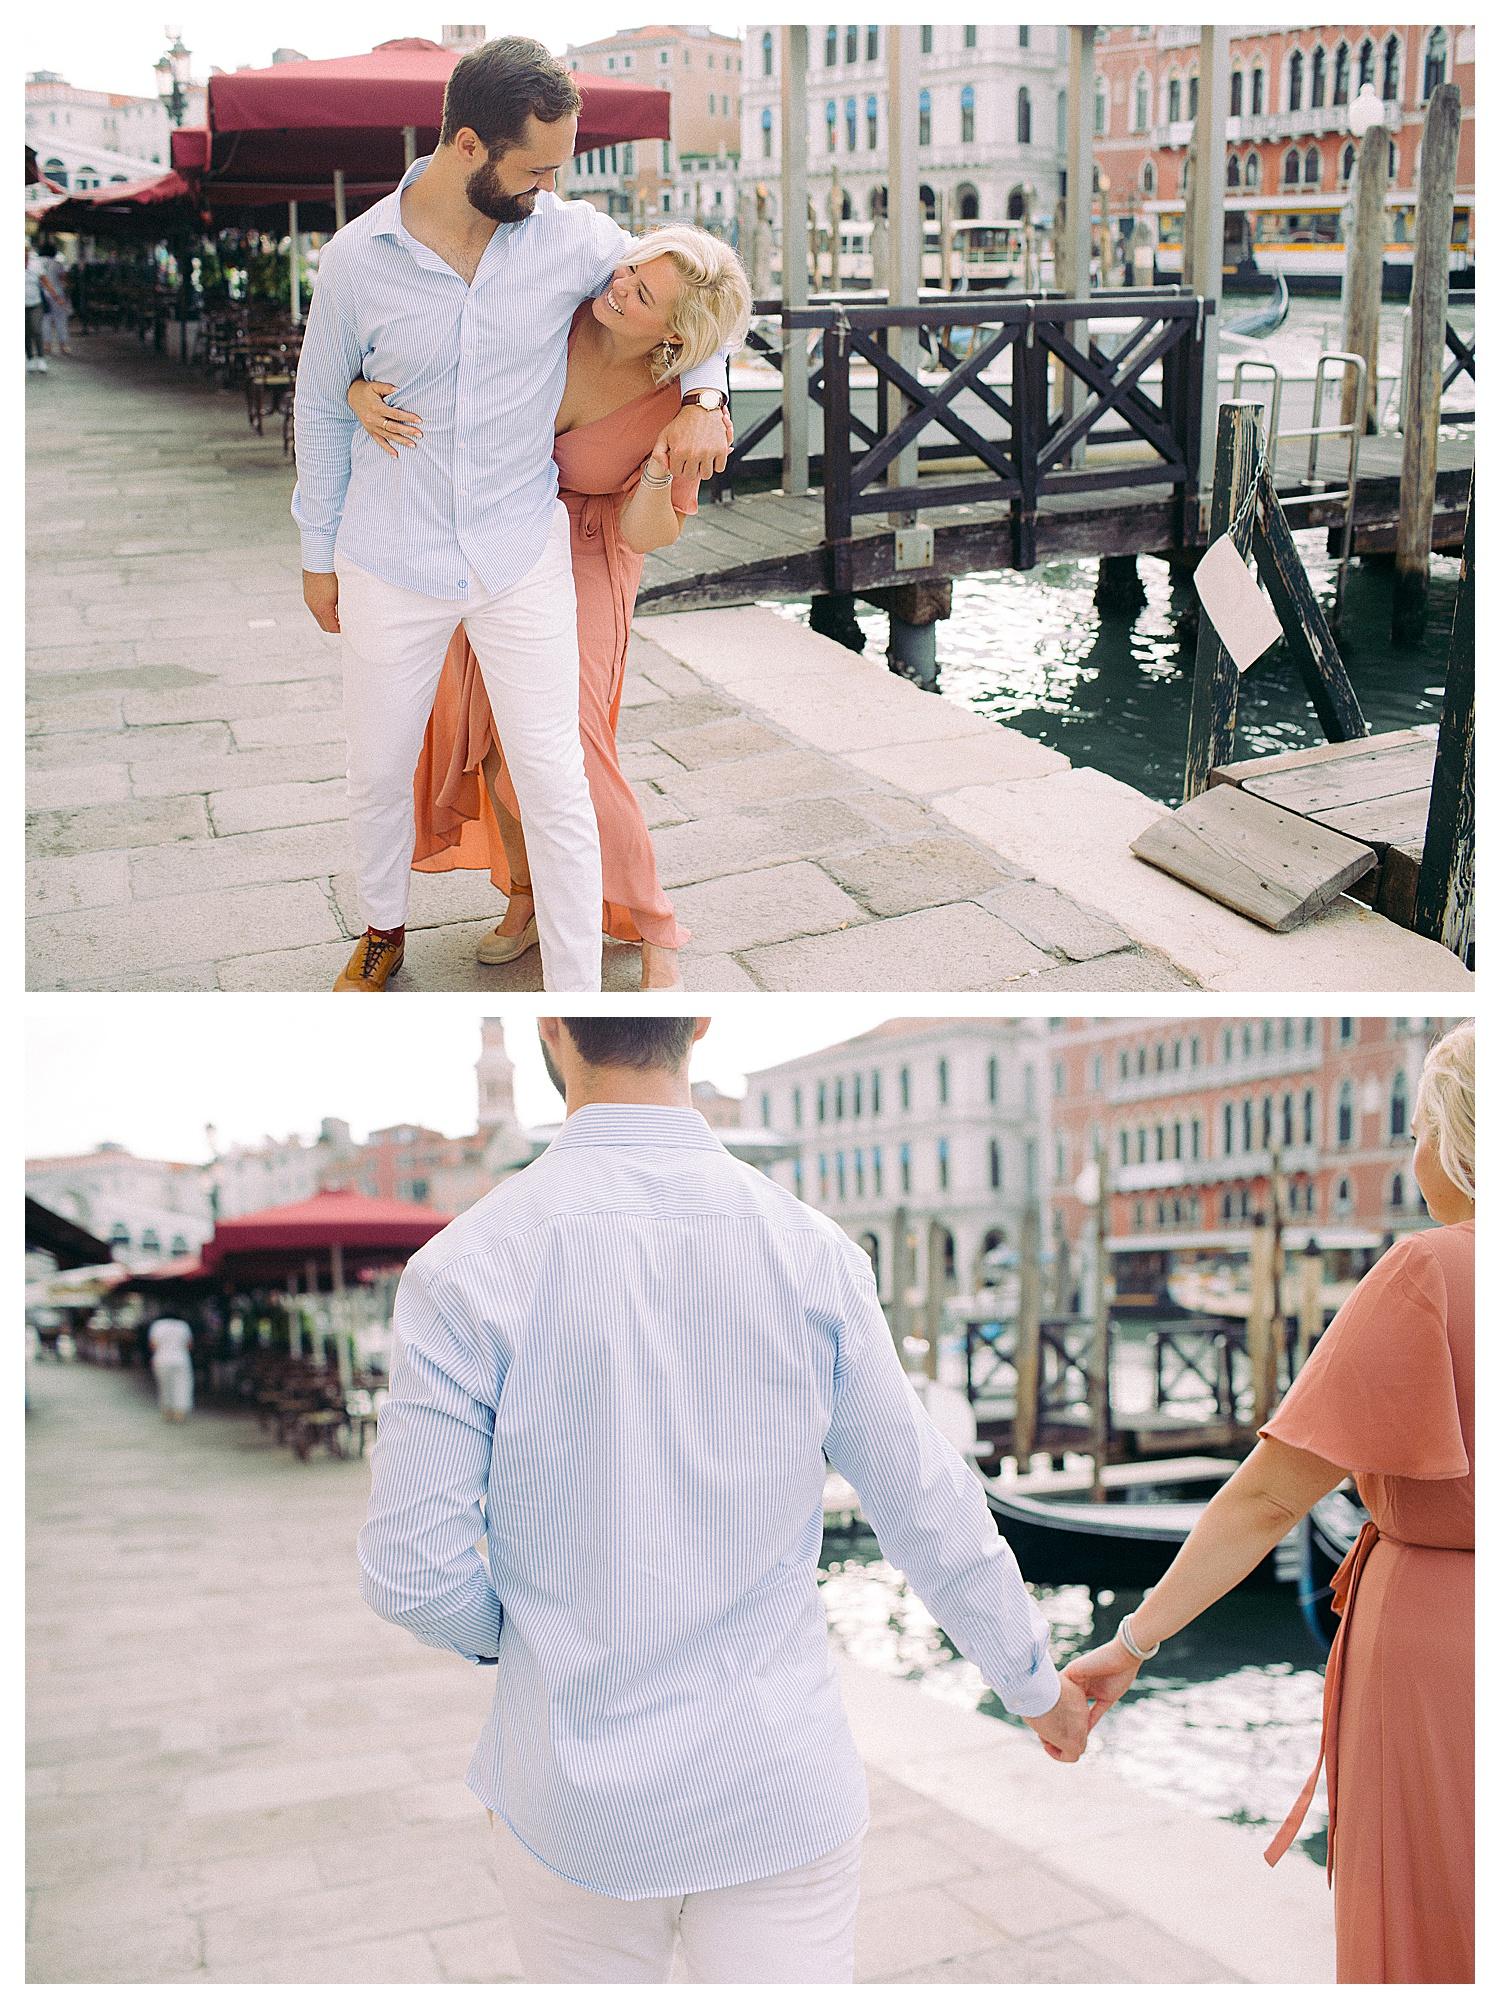 VENICE-COUPLE-PHOTOSHOOT-film-fuji-400h-stefano-degirmenci_0697.jpg